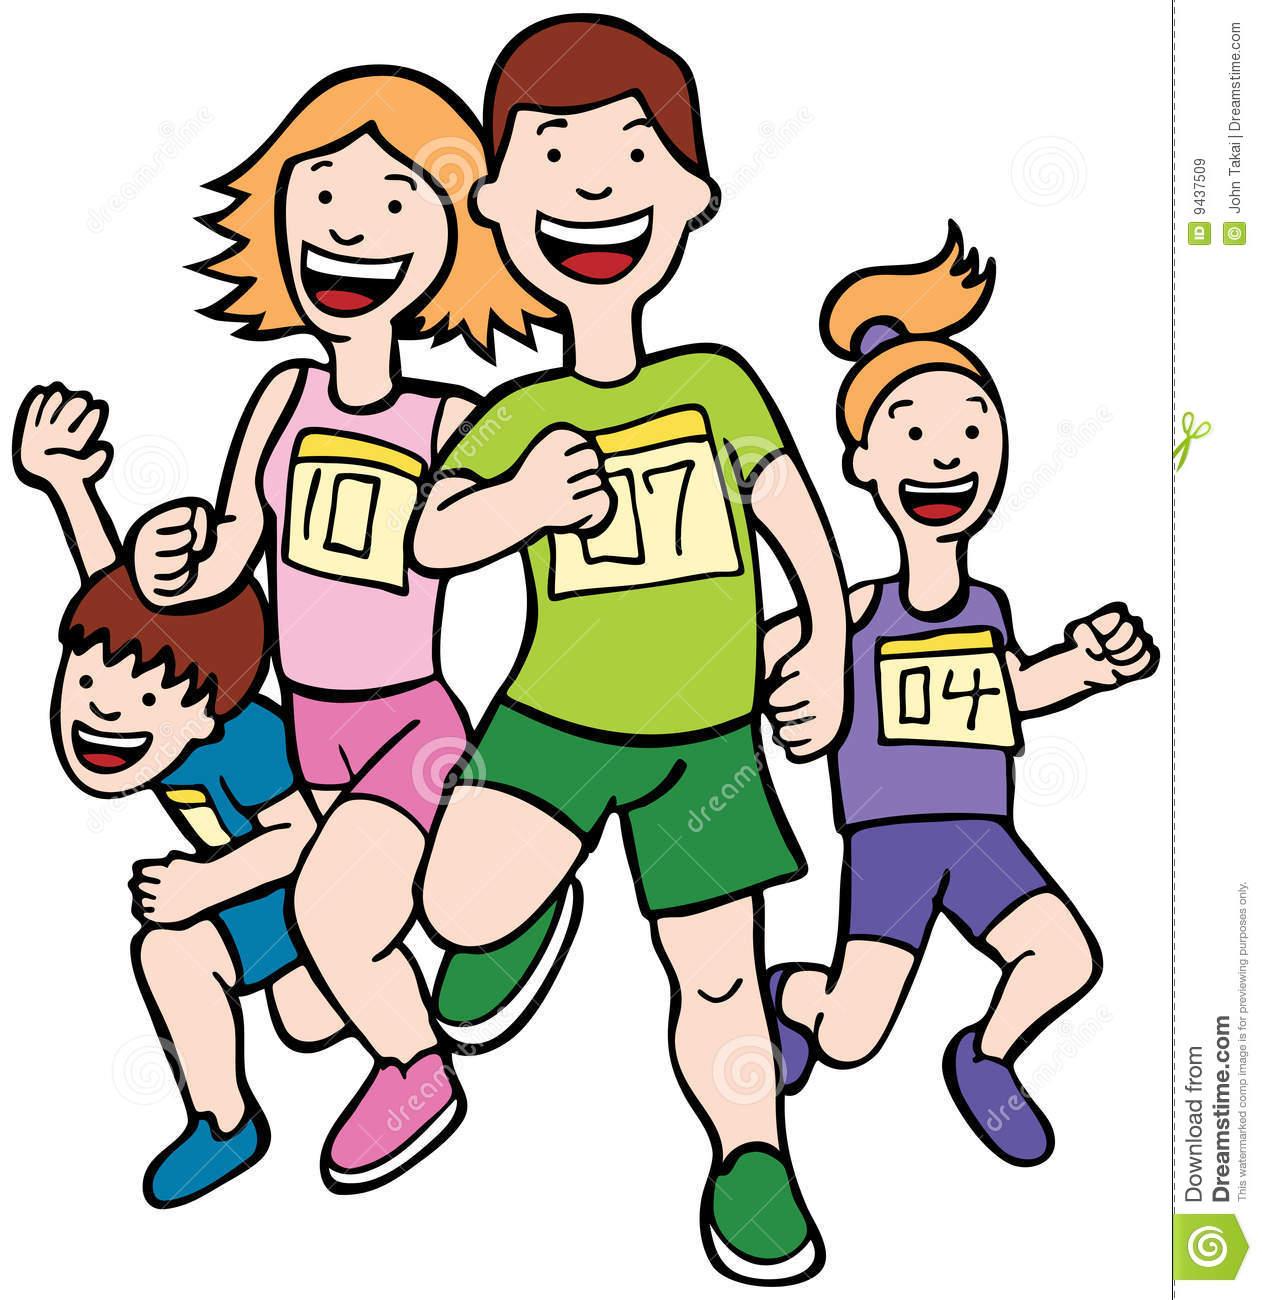 Running Race Clipart Free.